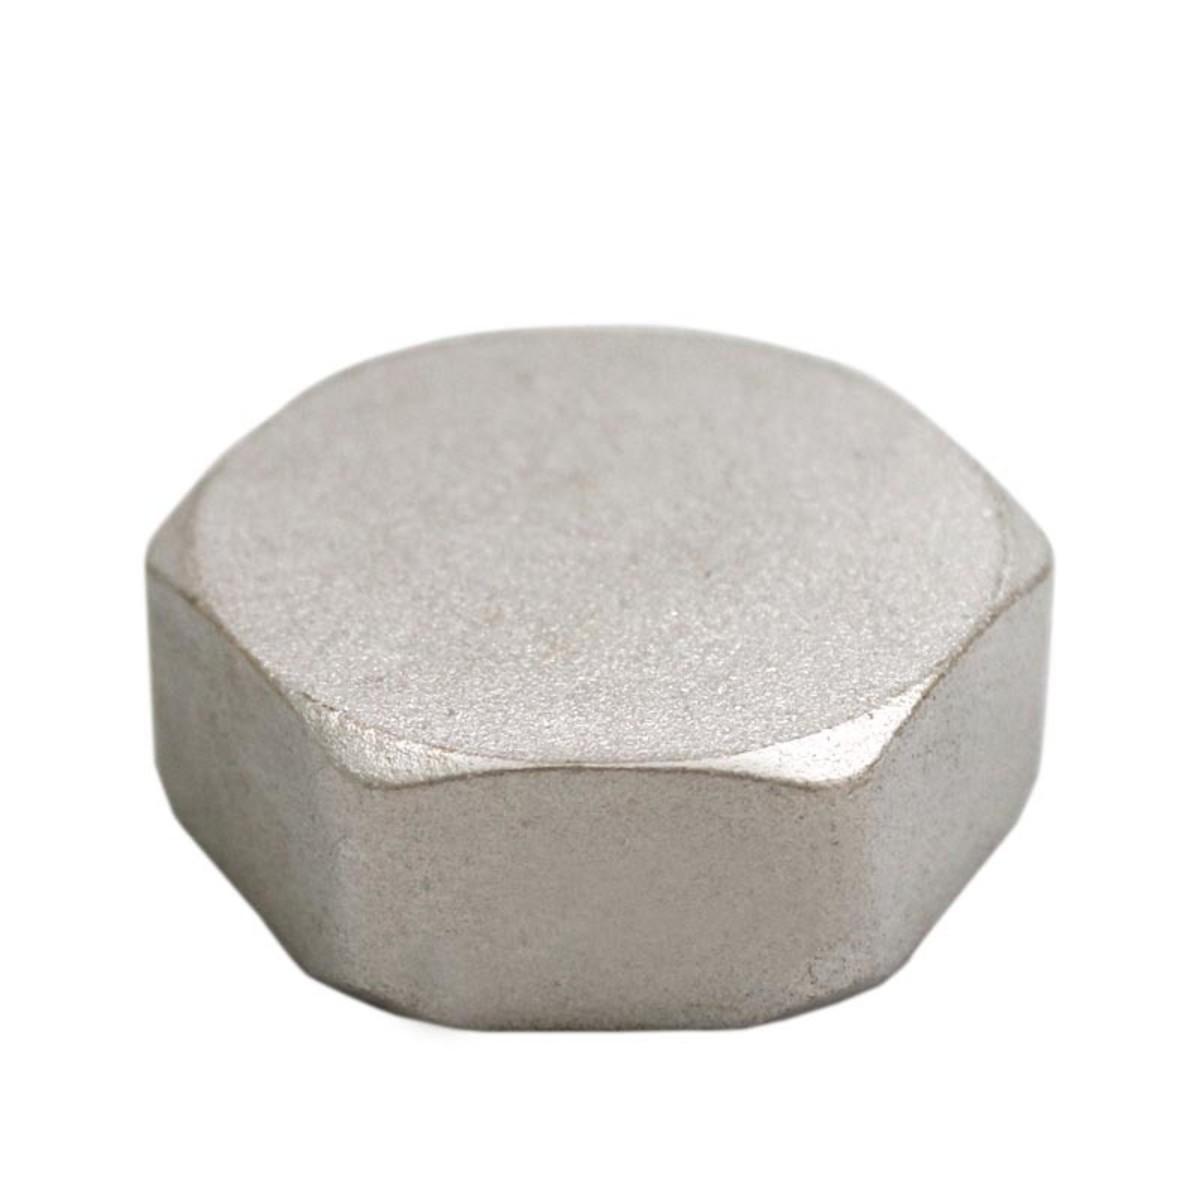 Заглушка внутренняя резьба 3/4 никелированная латунь